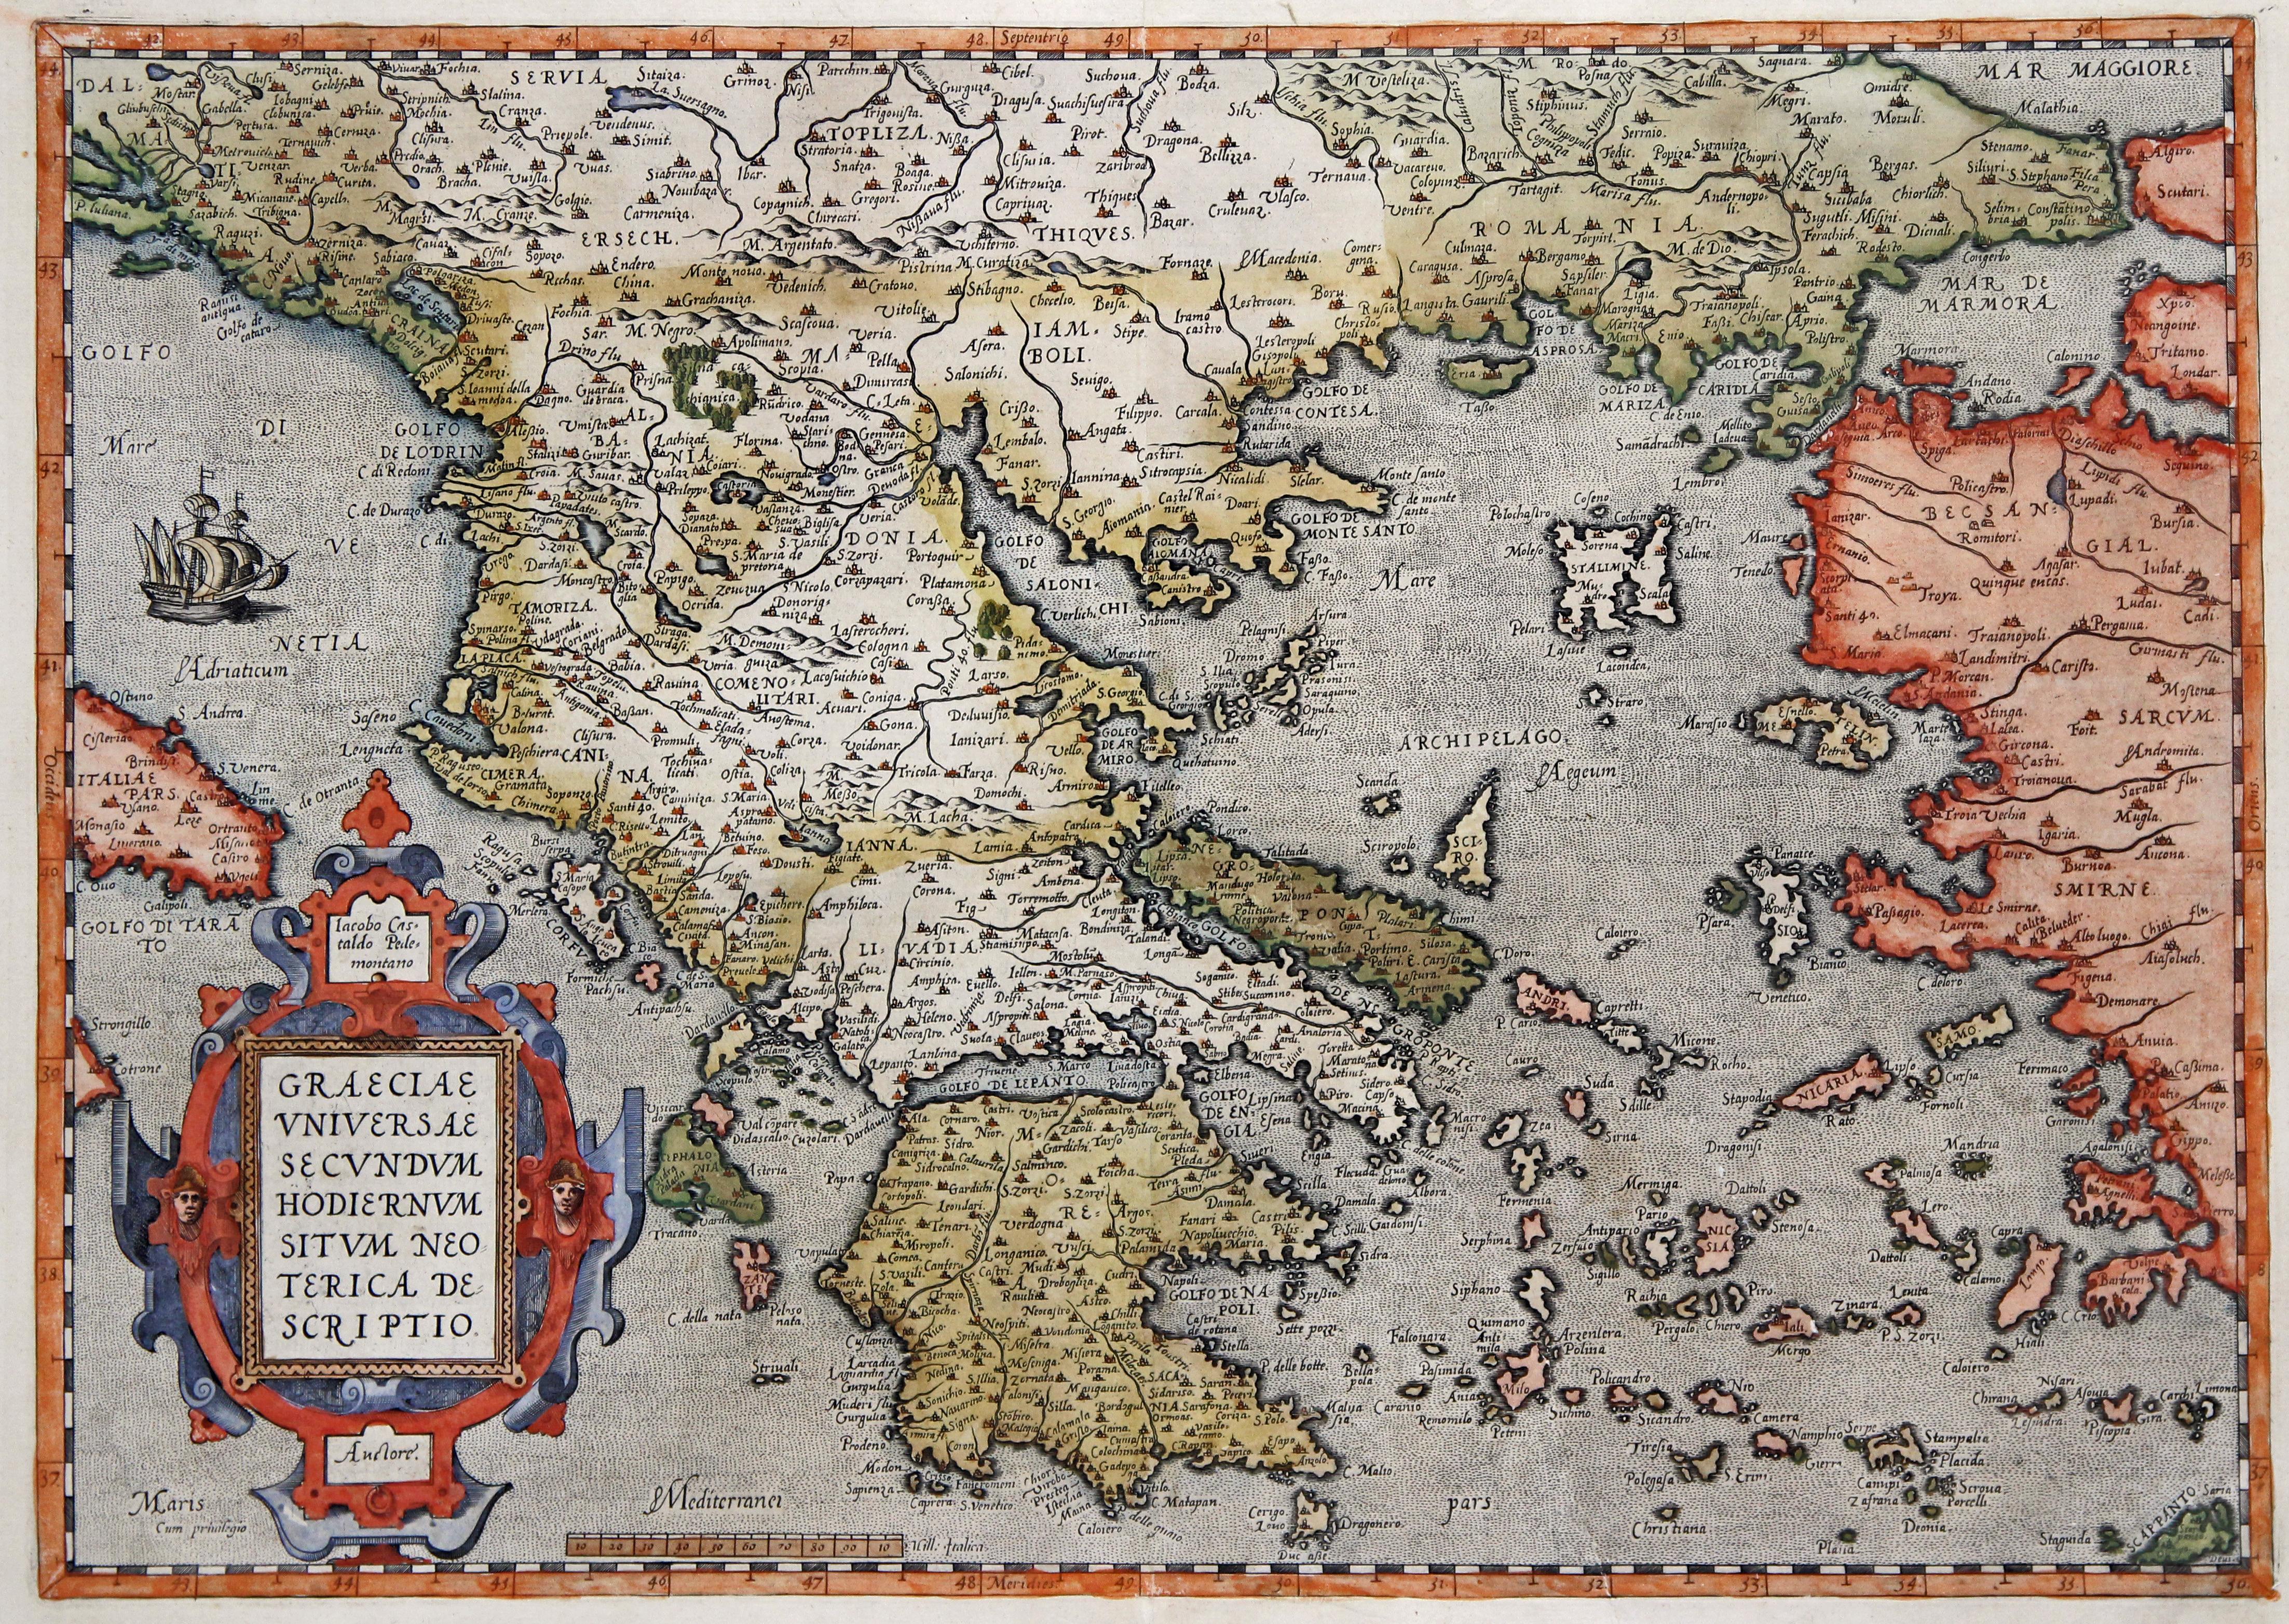 Kst.- Karte, n. I. Gastaldi b. Ortelius,: Griechenland ( Greece